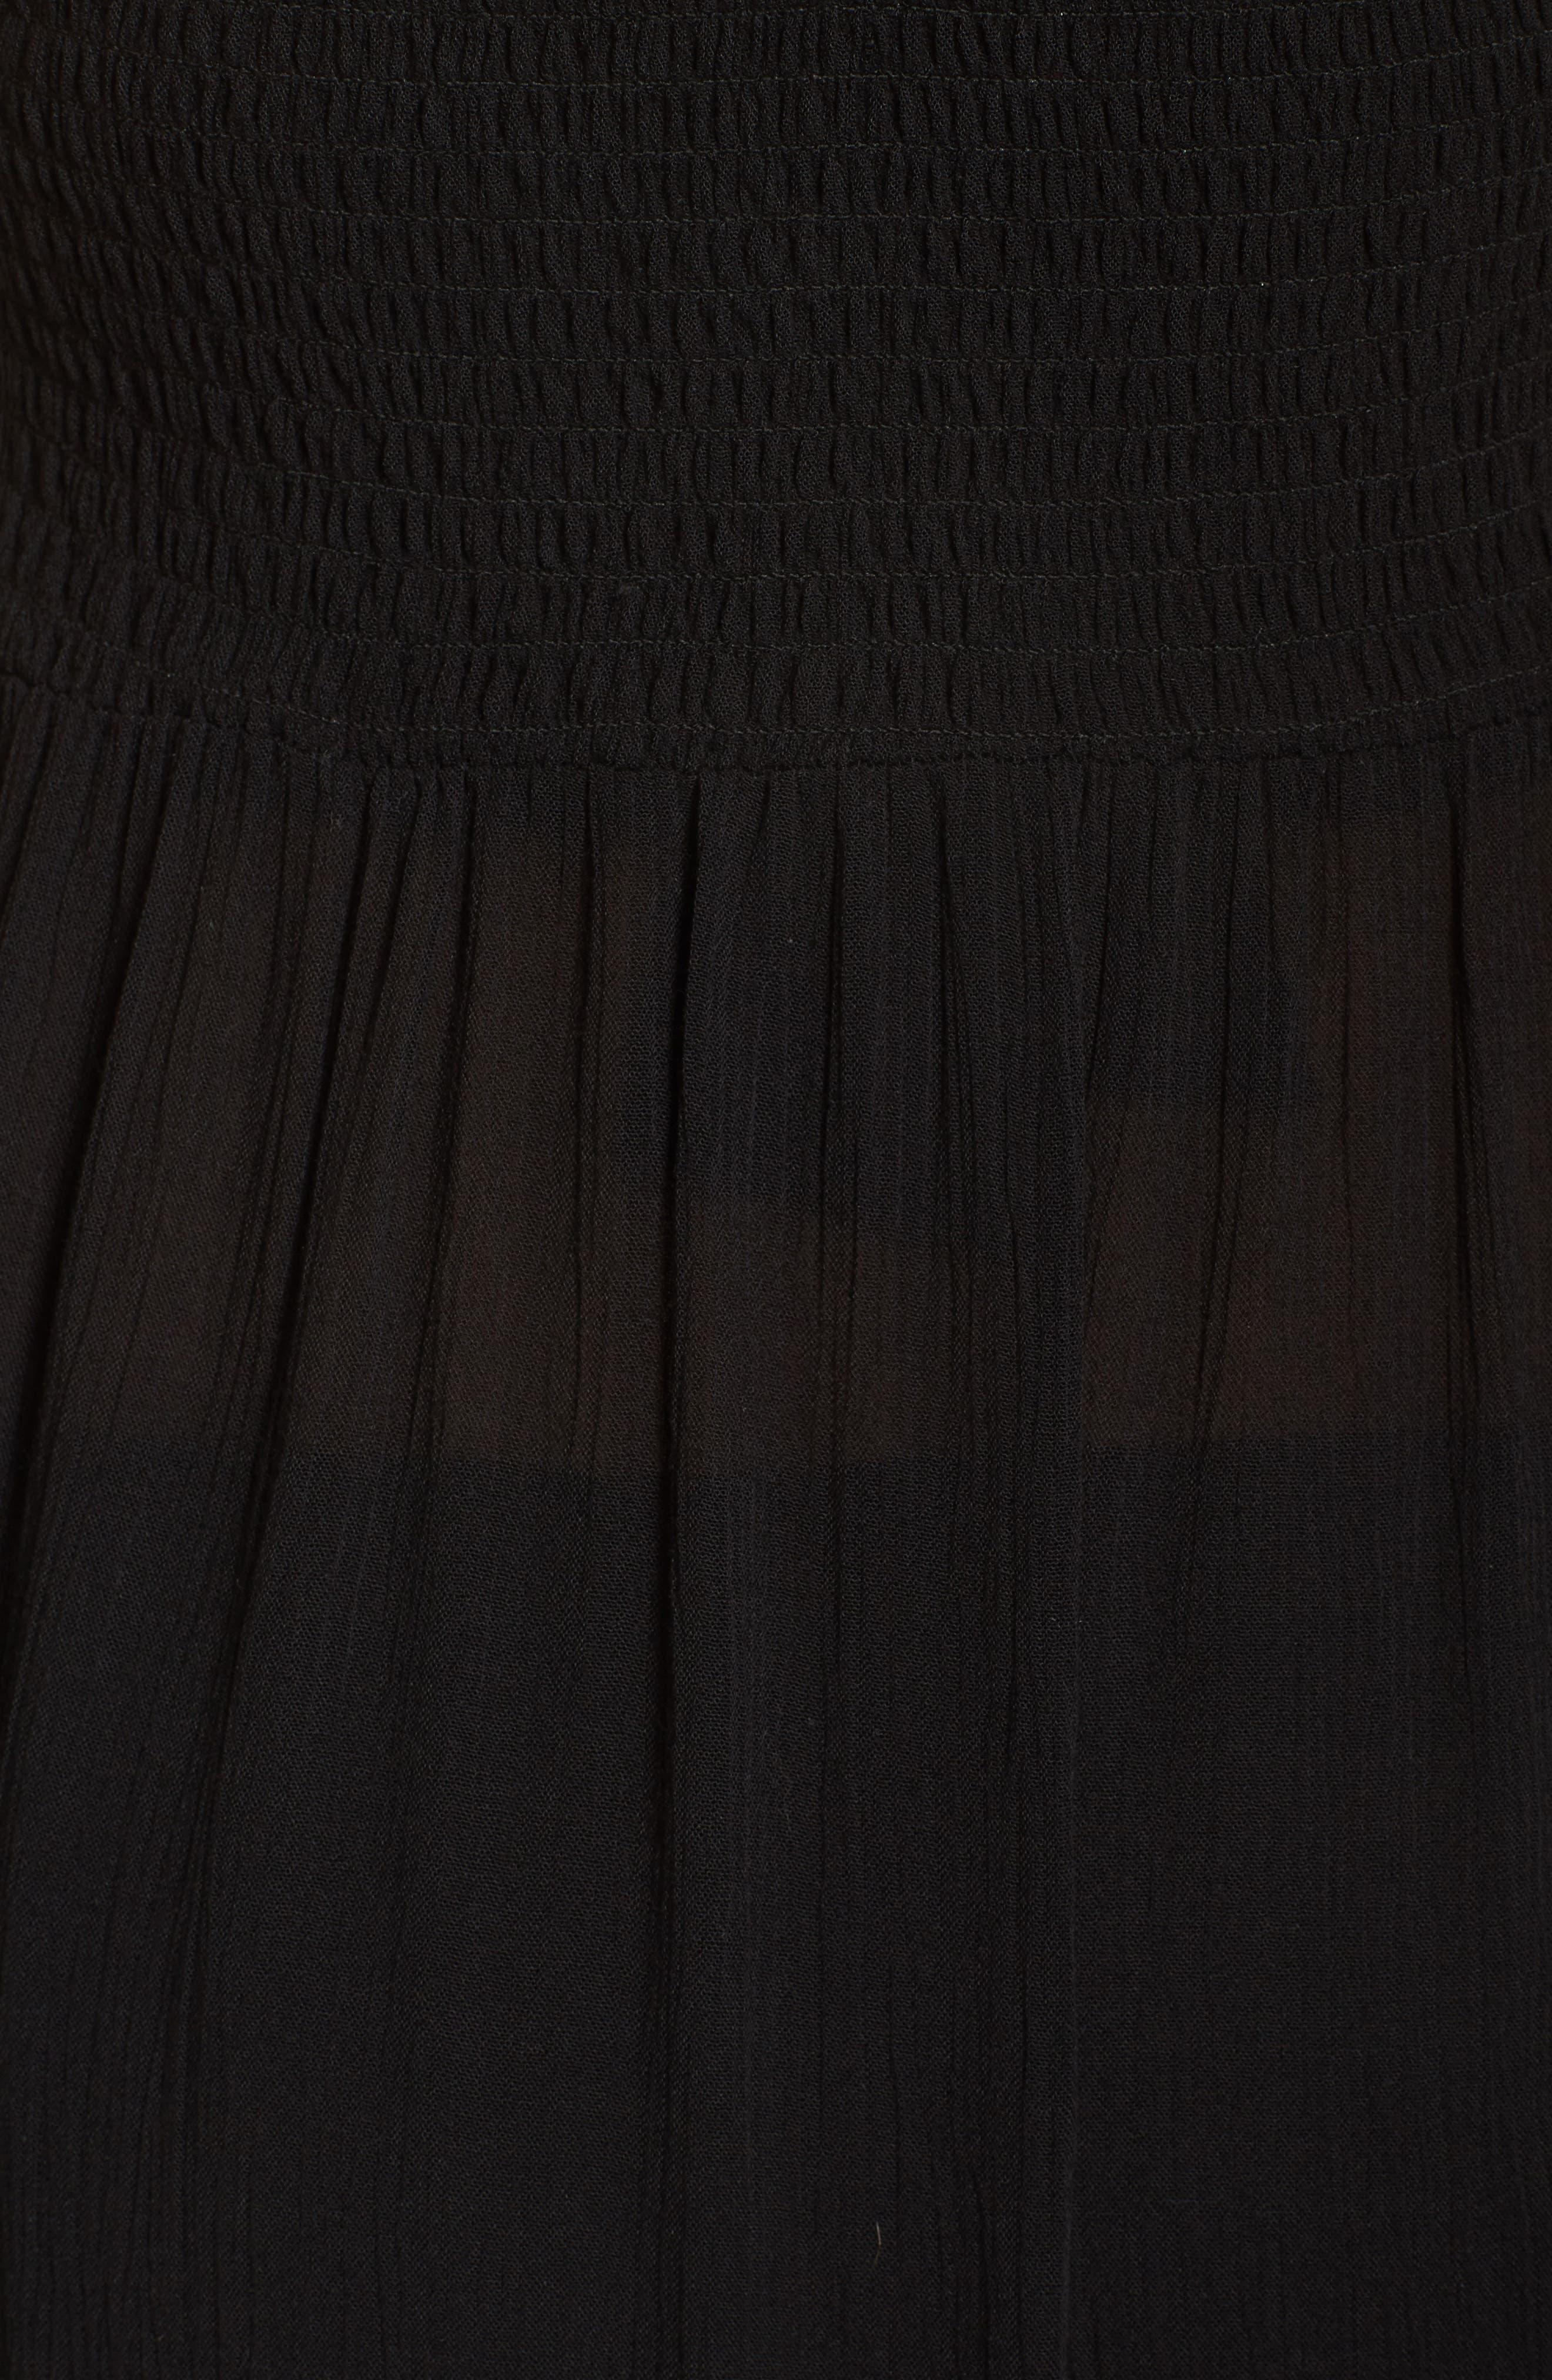 Midi Tie Back Cover-Up Dress,                             Alternate thumbnail 5, color,                             001